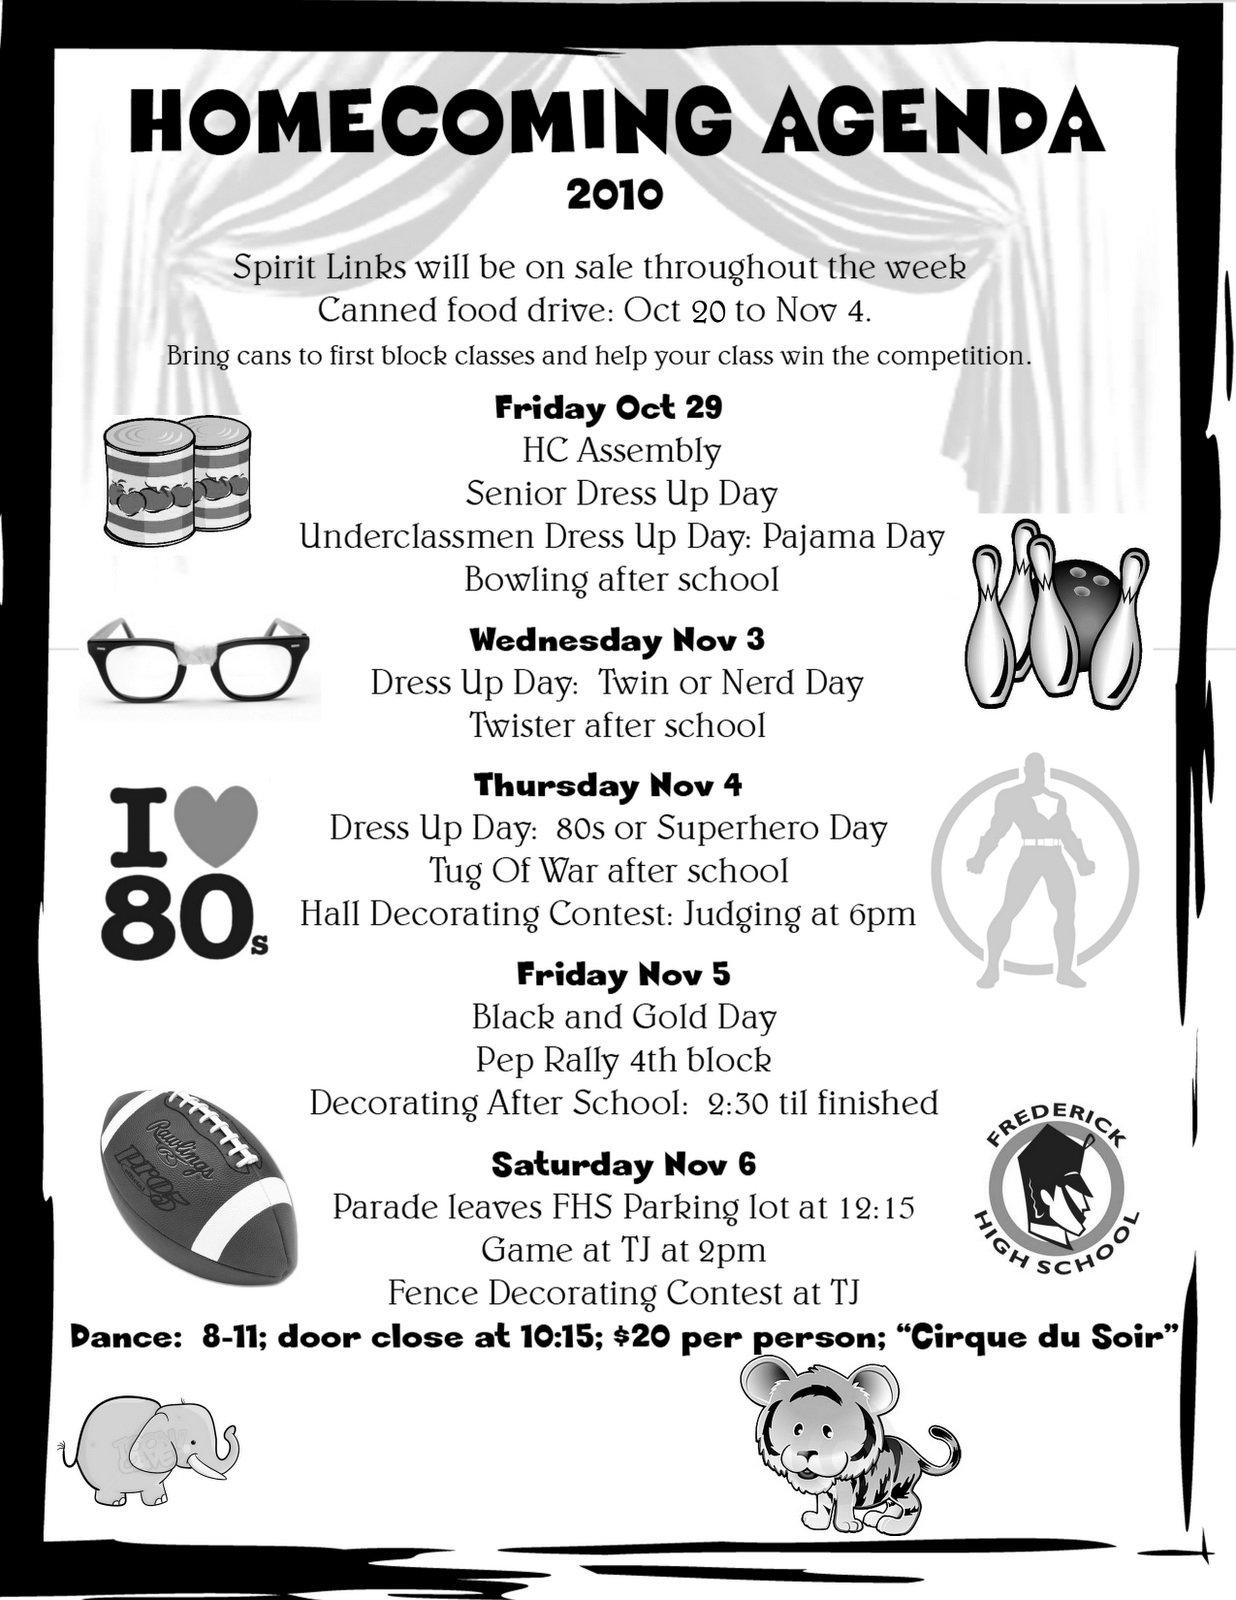 10 Gorgeous Spirit Days Ideas For High School homecoming week spirit days student council ideas pinterest 3 2021